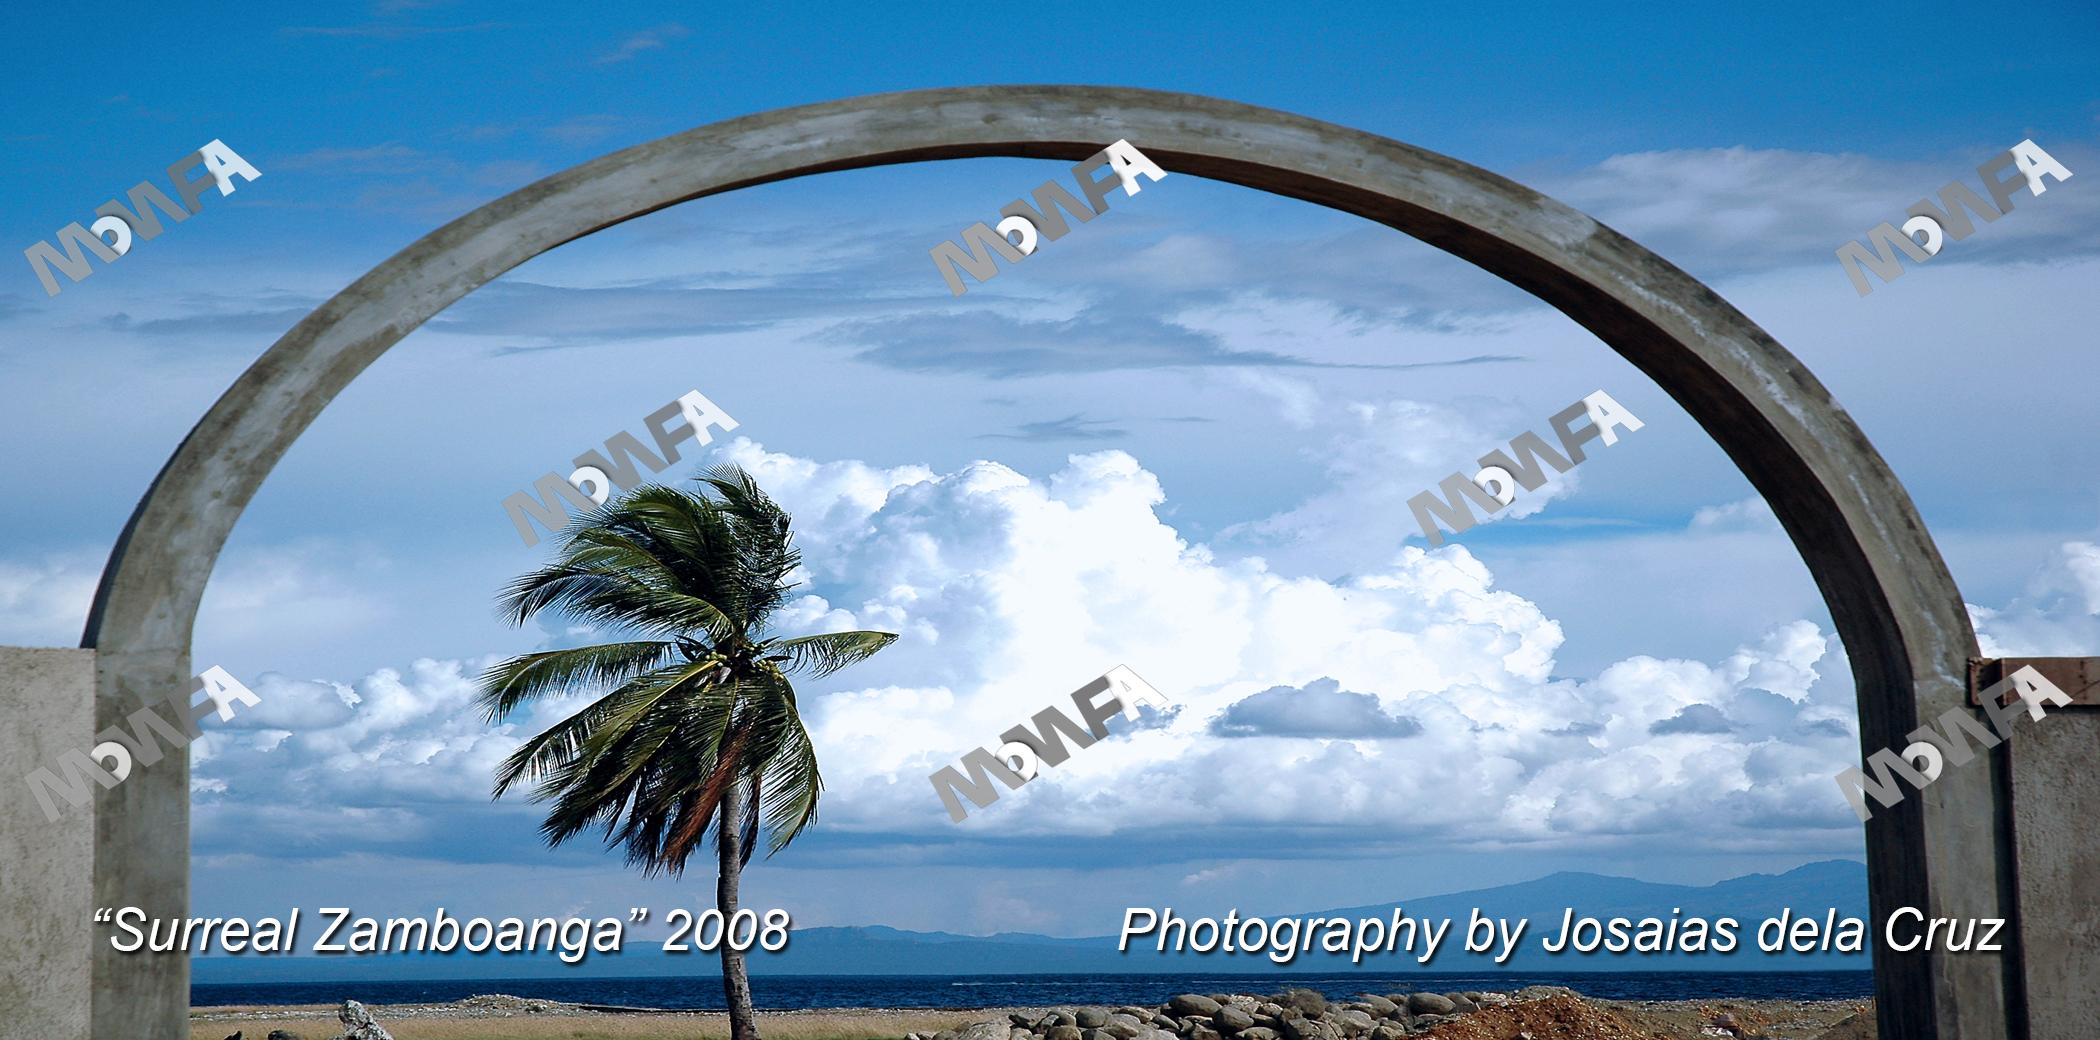 10 Surreal Zamboanga wmc.jpg